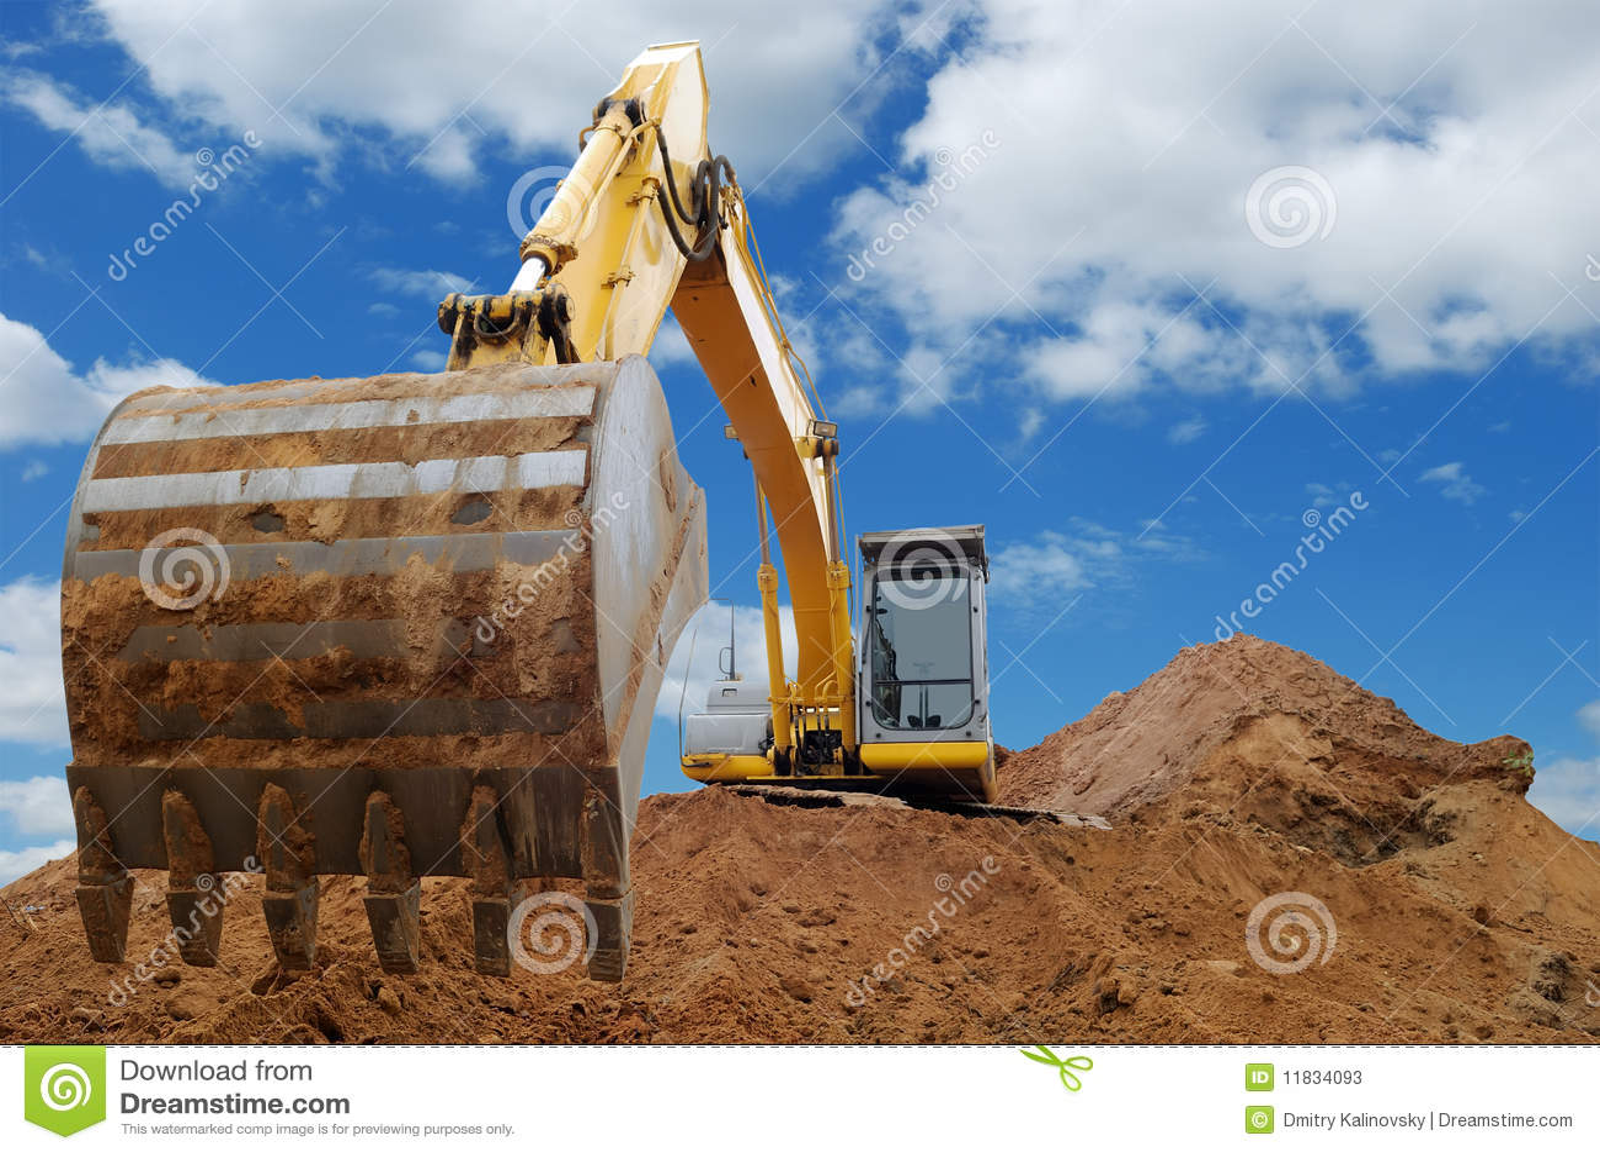 excavator loader bulldozer with big bucket stock photos image